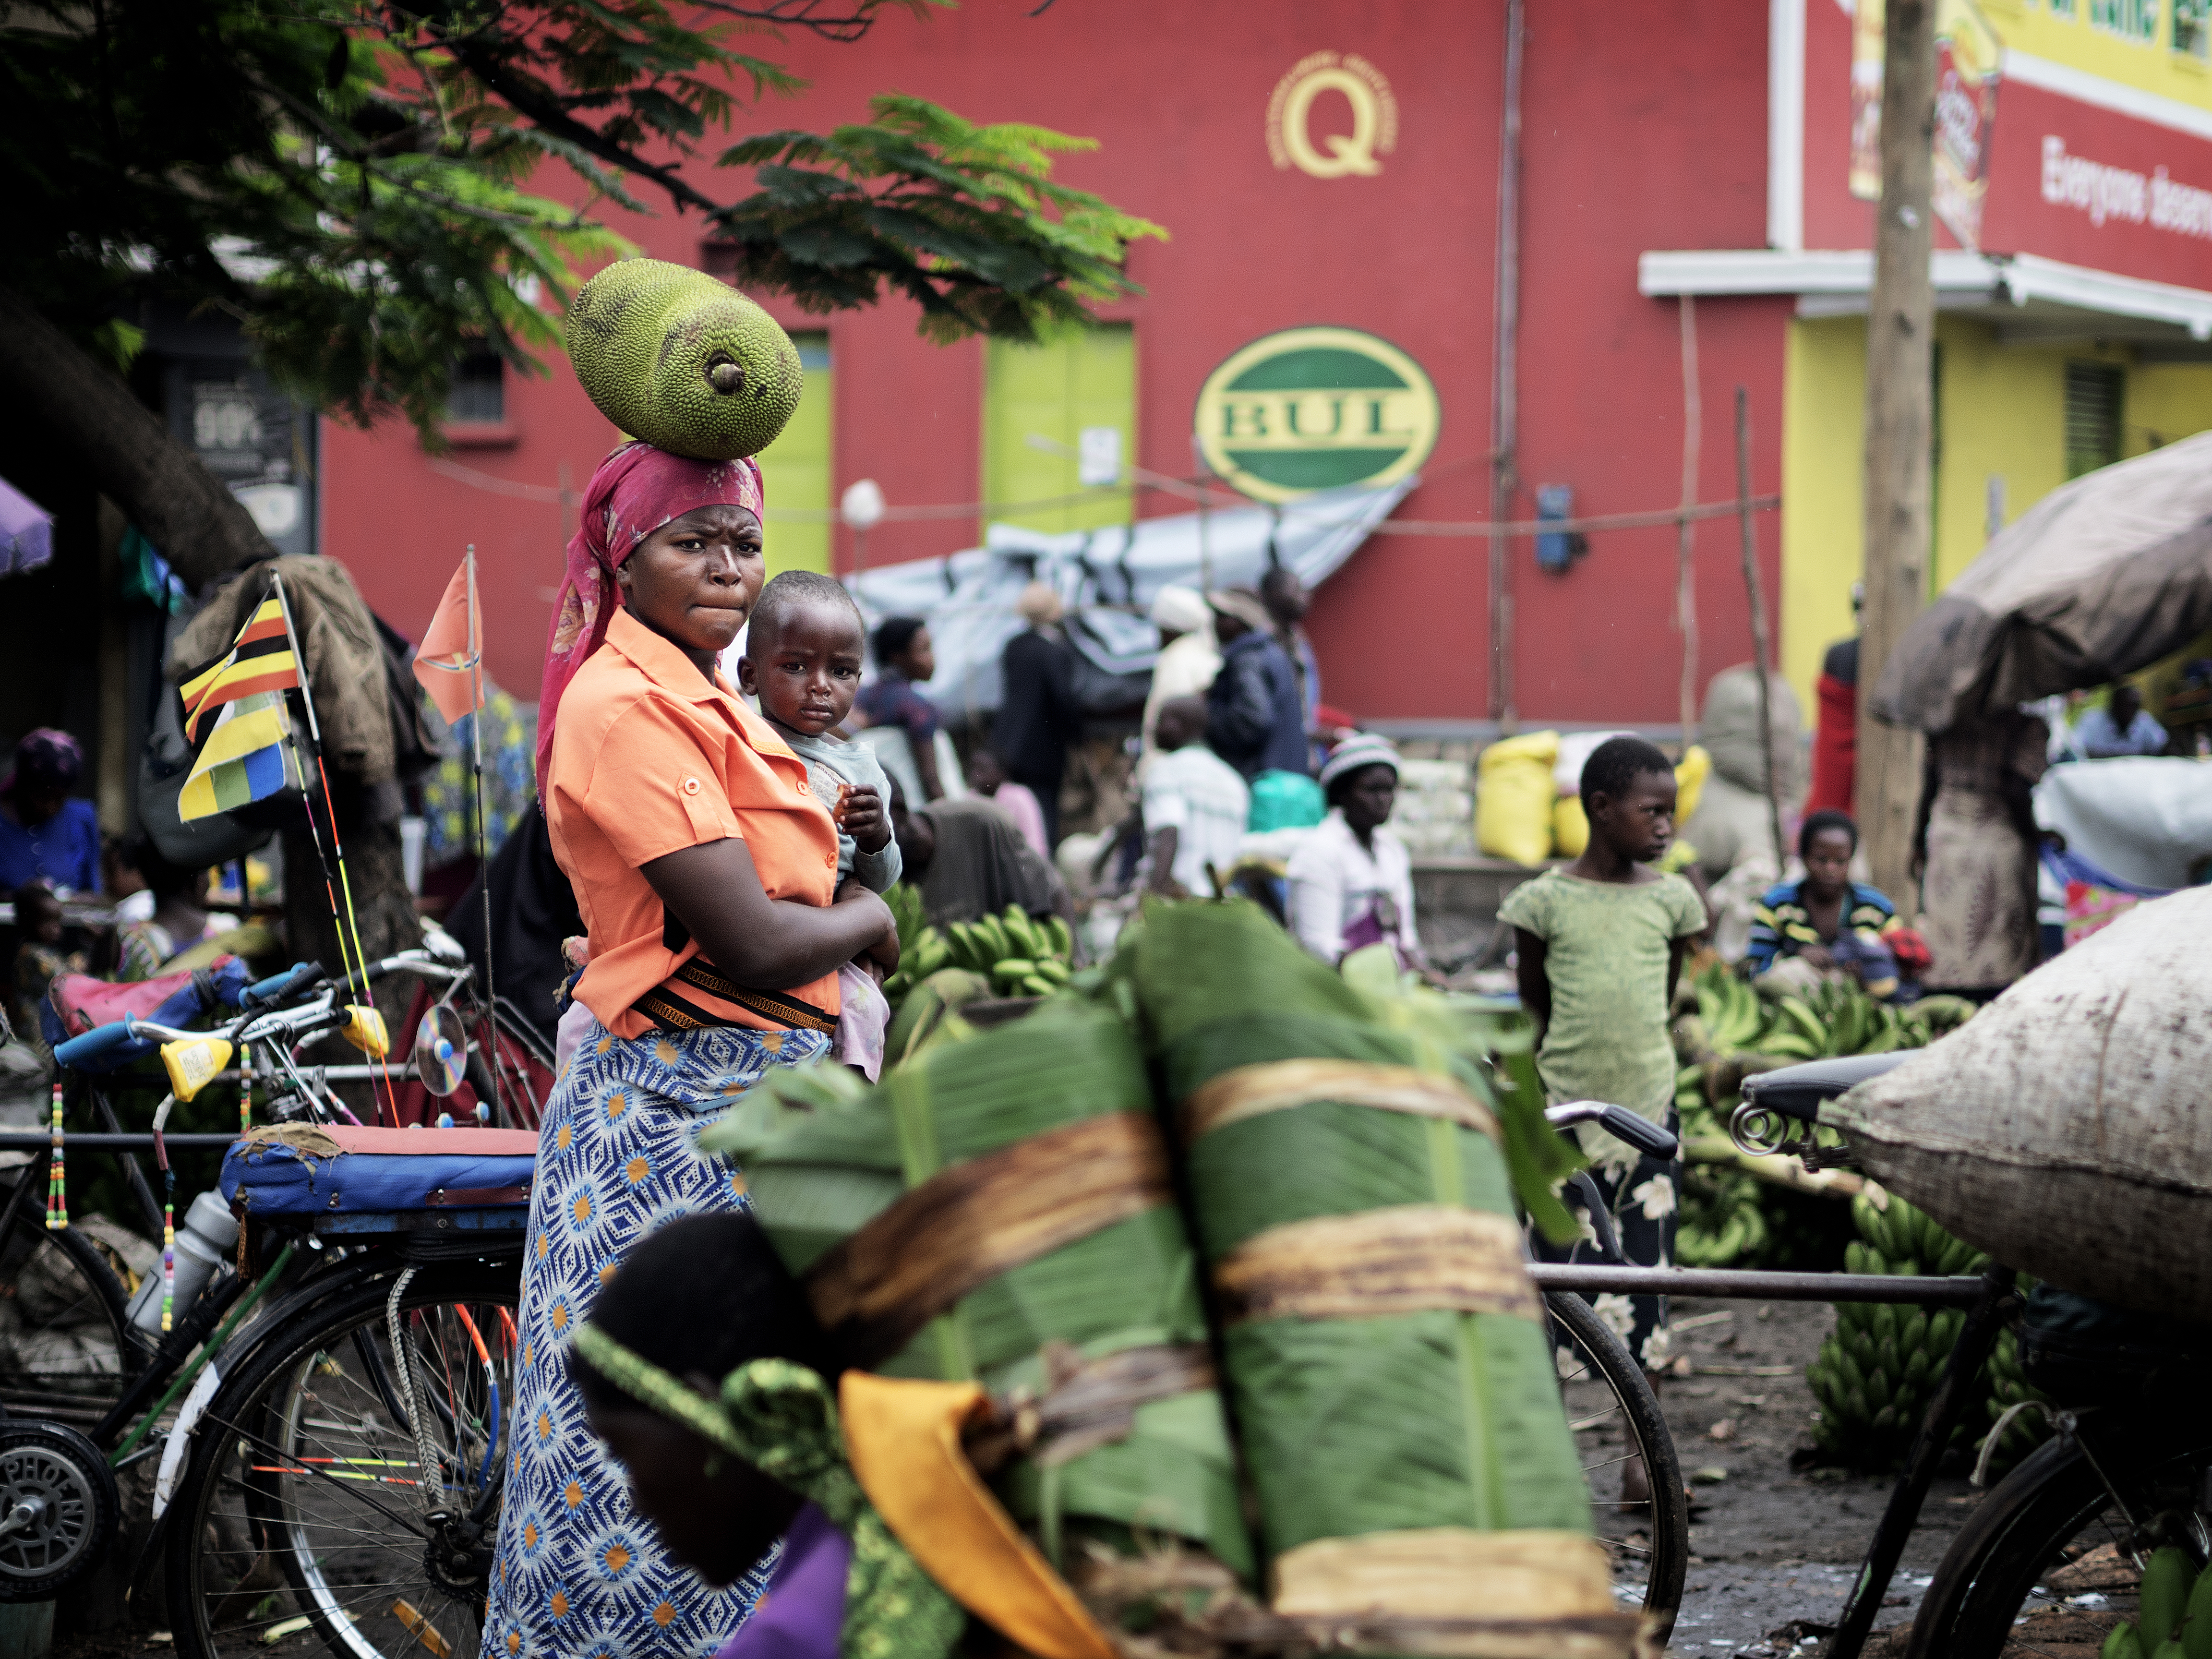 Markedsplads i Uganda, 2015